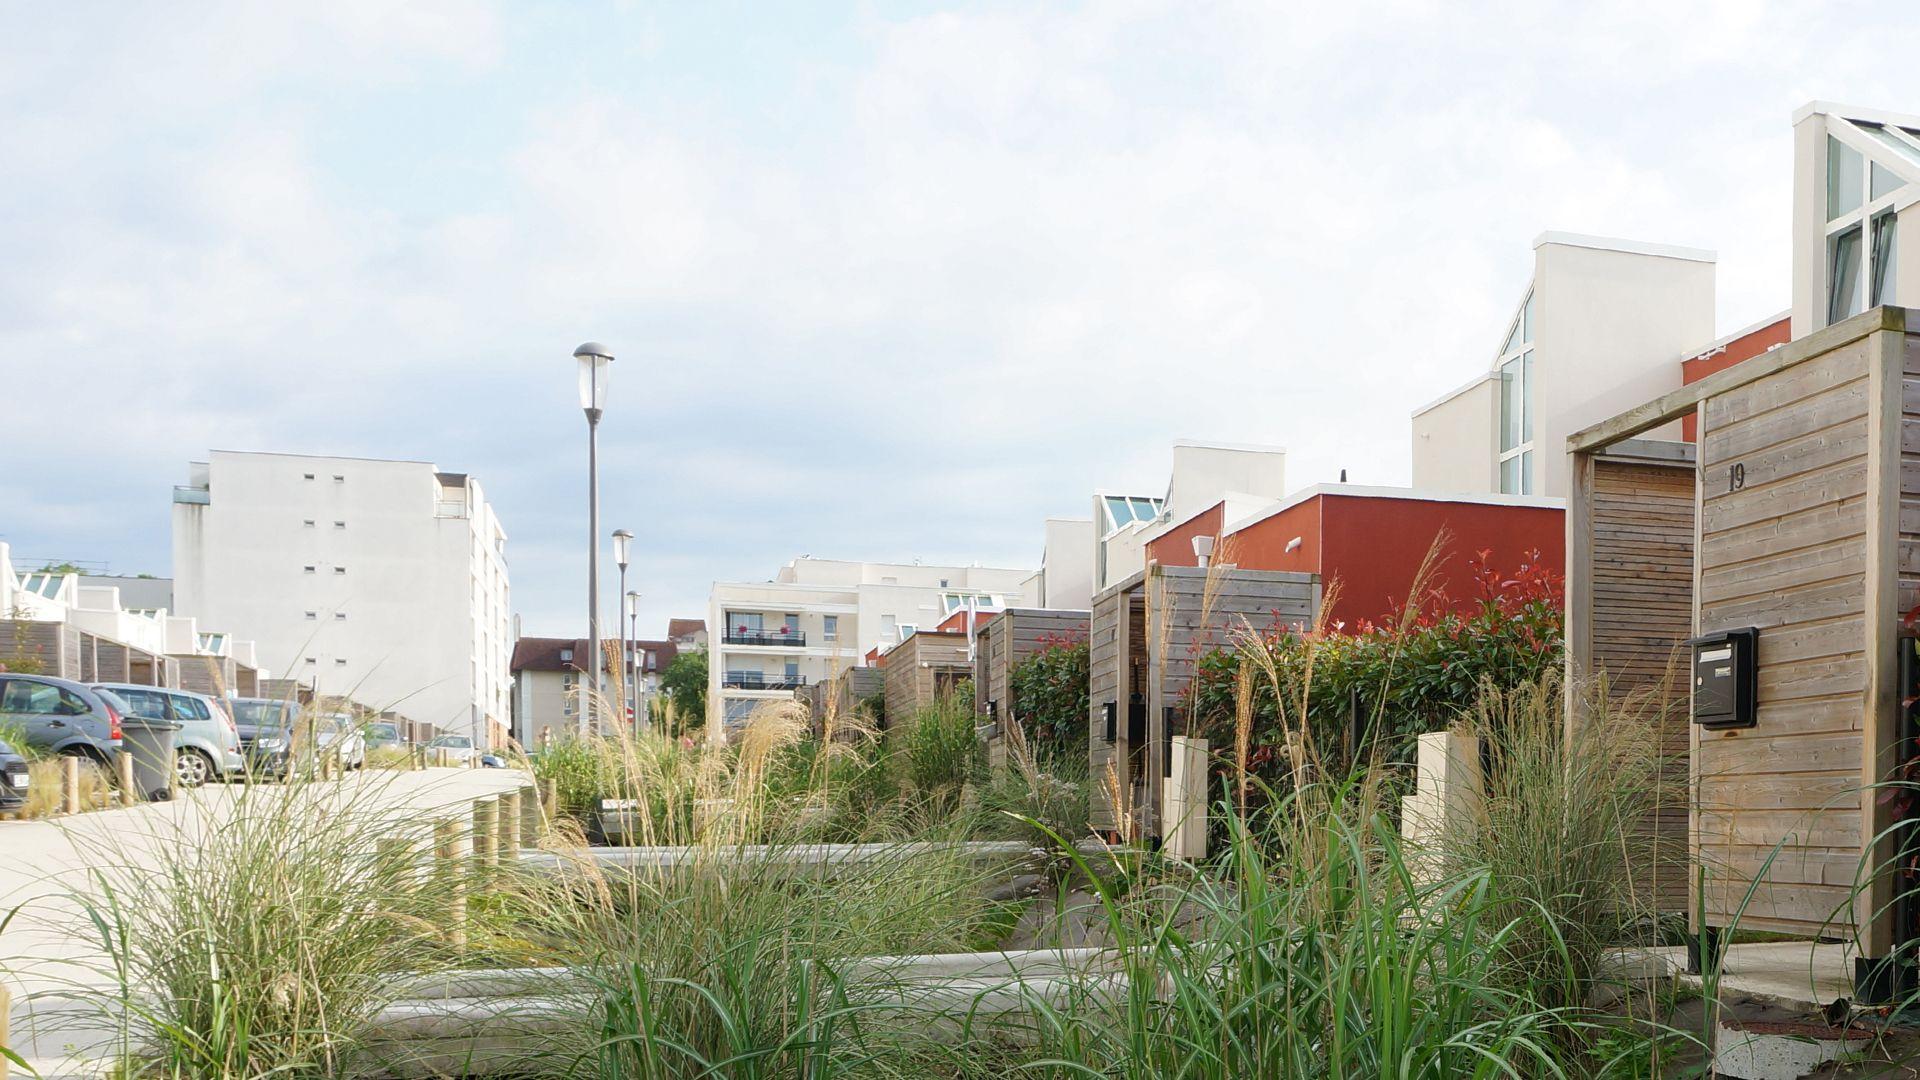 http://www.attica-urbanisme.com/projet/ecoquartier-du-parc-matisse ...